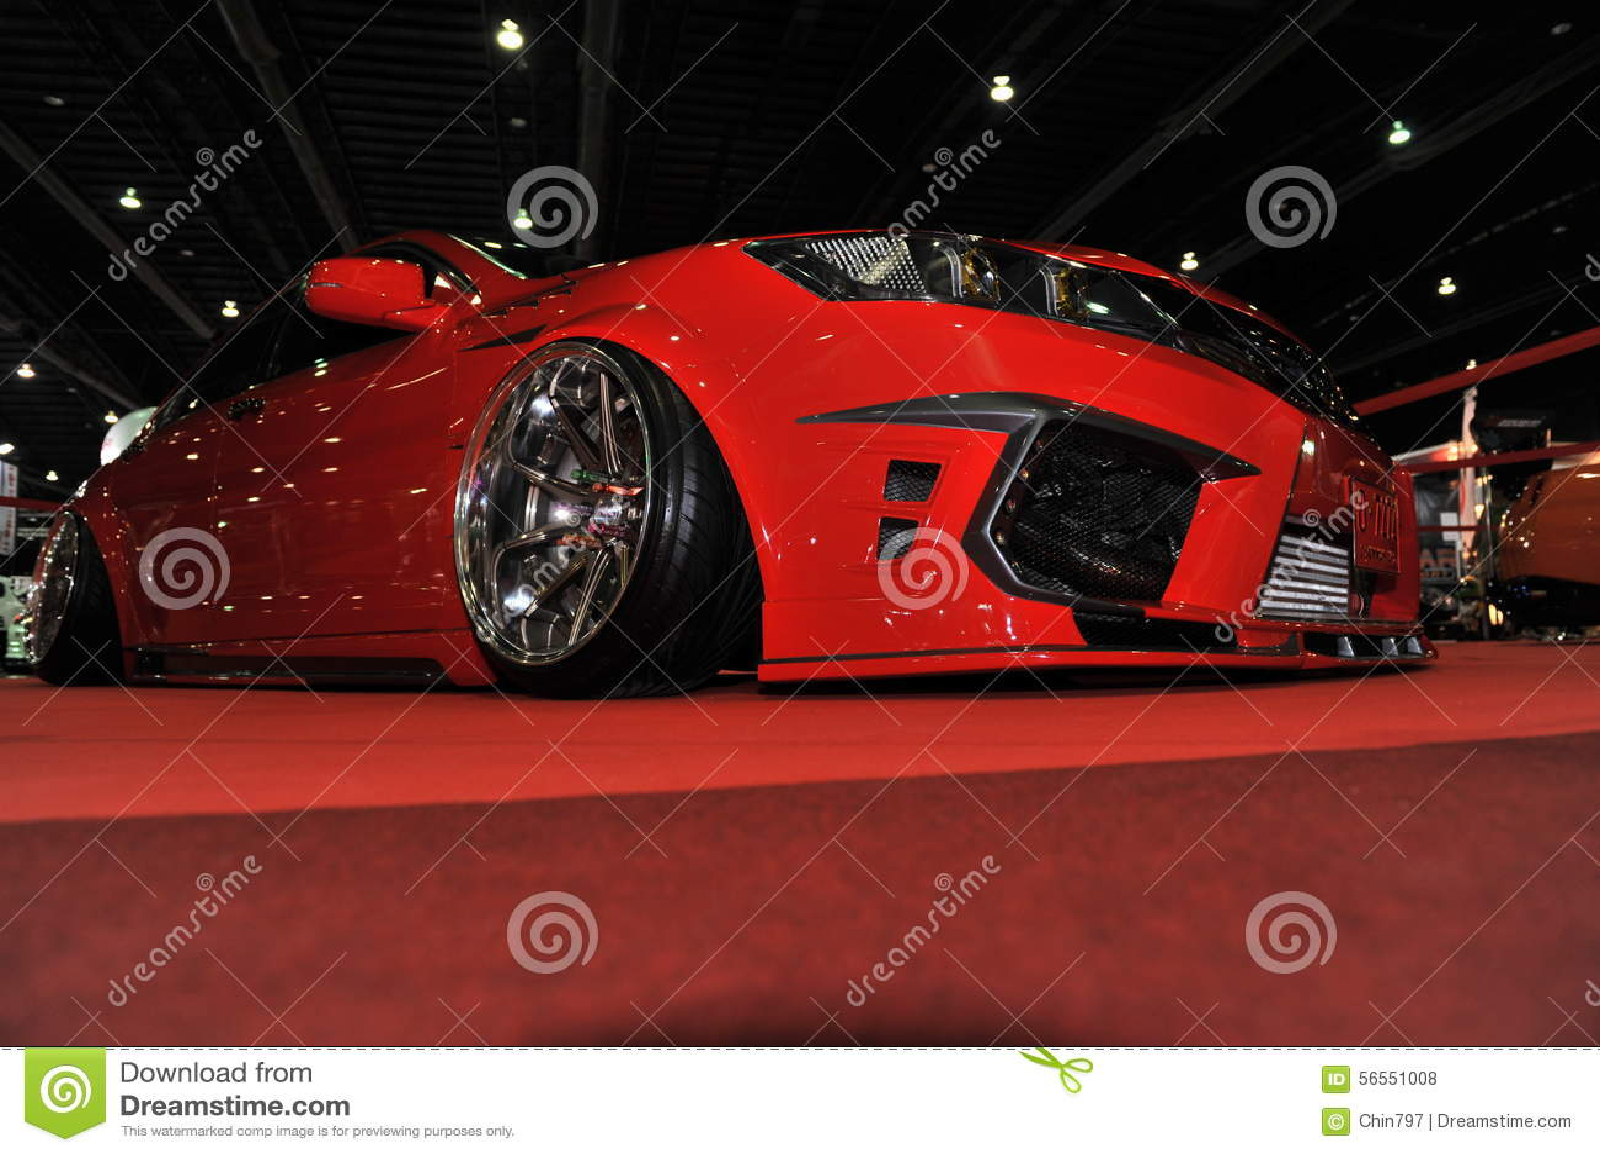 Download Αυτοκίνητο της Honda στο 3$ο διεθνές Autosalon 2015 της Μπανγκόκ στις 27 Ιουνίου 2015 στη Μπανγκόκ, Ταϊλάνδη Εκδοτική Στοκ Εικόνες - εικόνα από μόδα, αυτοκίνητο: 56551008